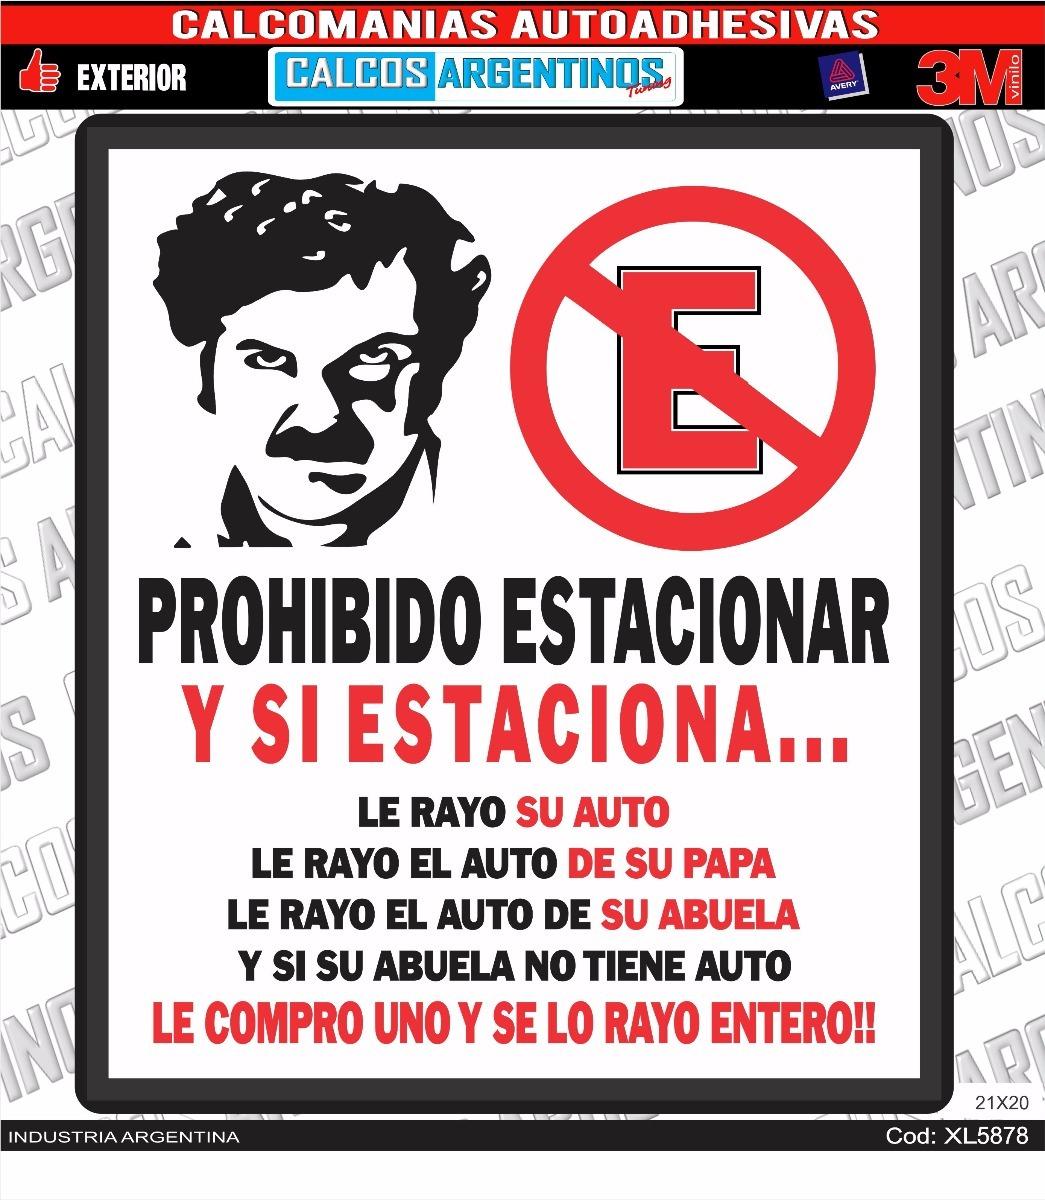 Prohibido Estacionar Pablo Escobar 21x20 Vinilo Autoadhesivo - $ 80 ...